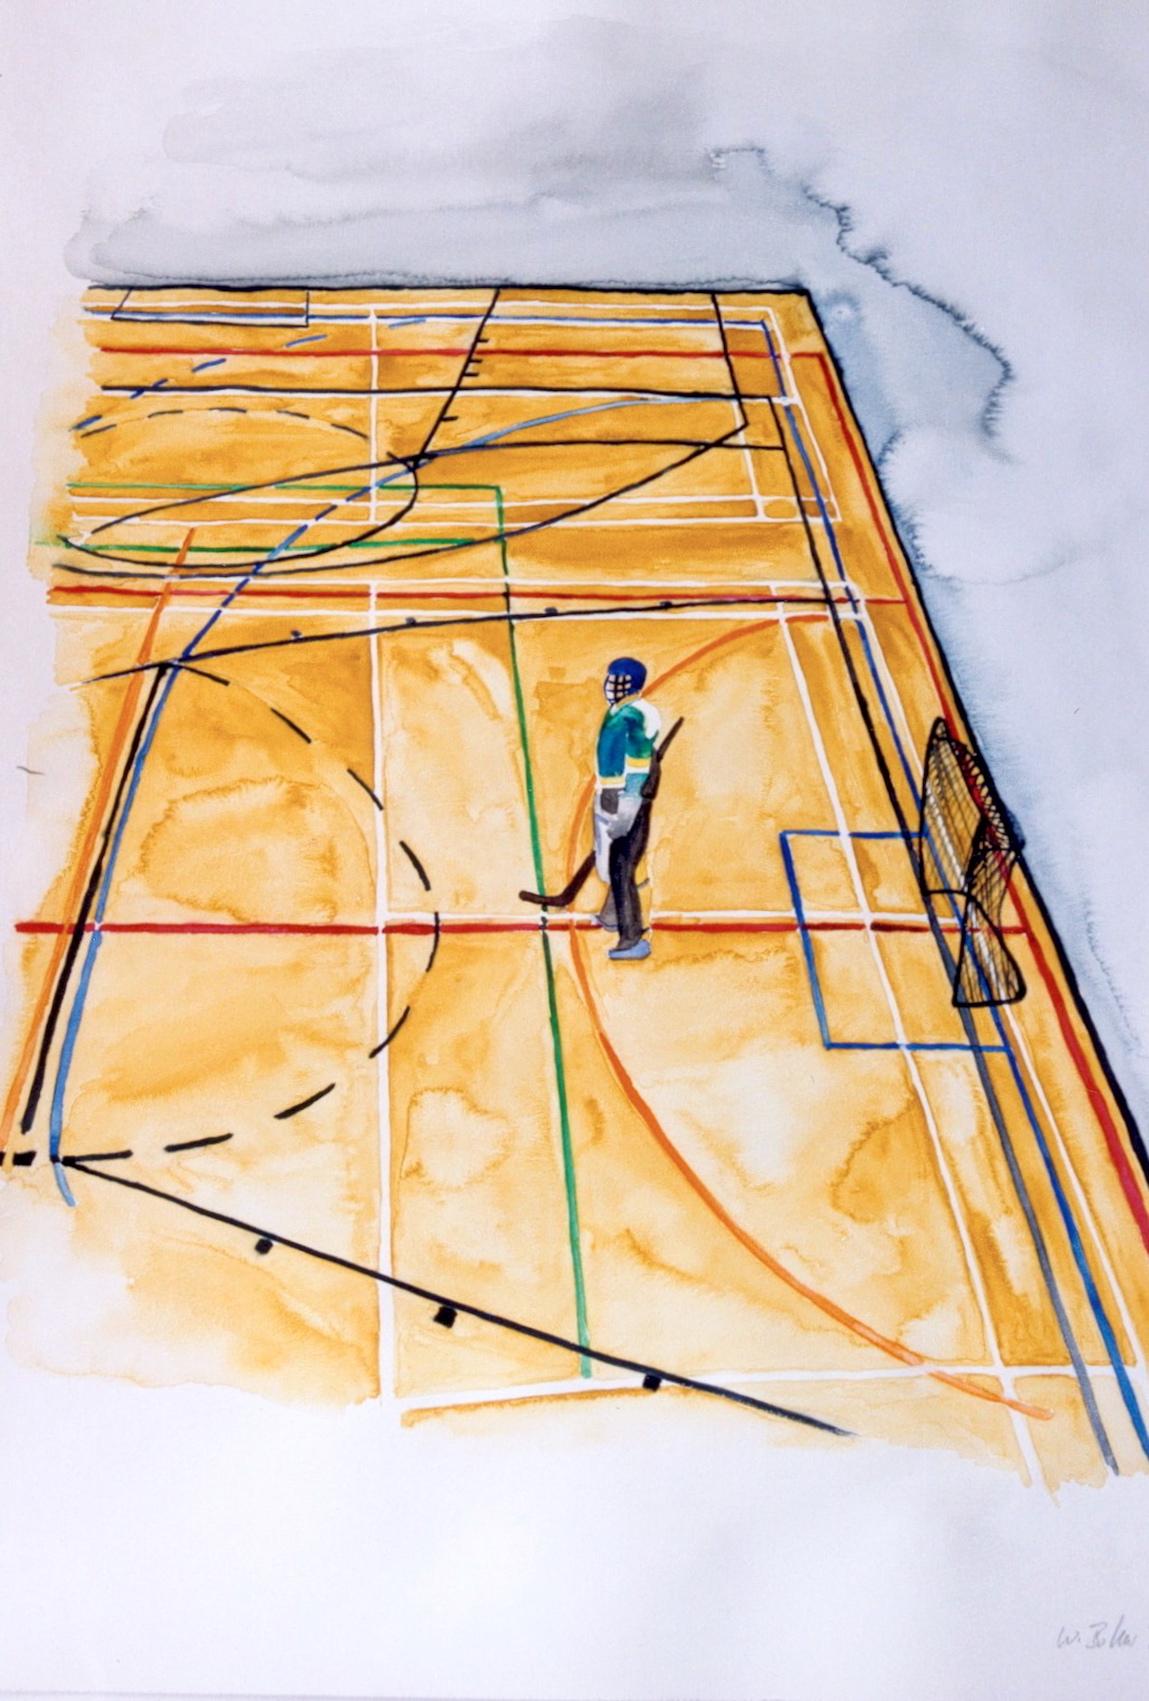 Play-Ground, Aquarell auf Bütten, 2005, 70 x 50 cm